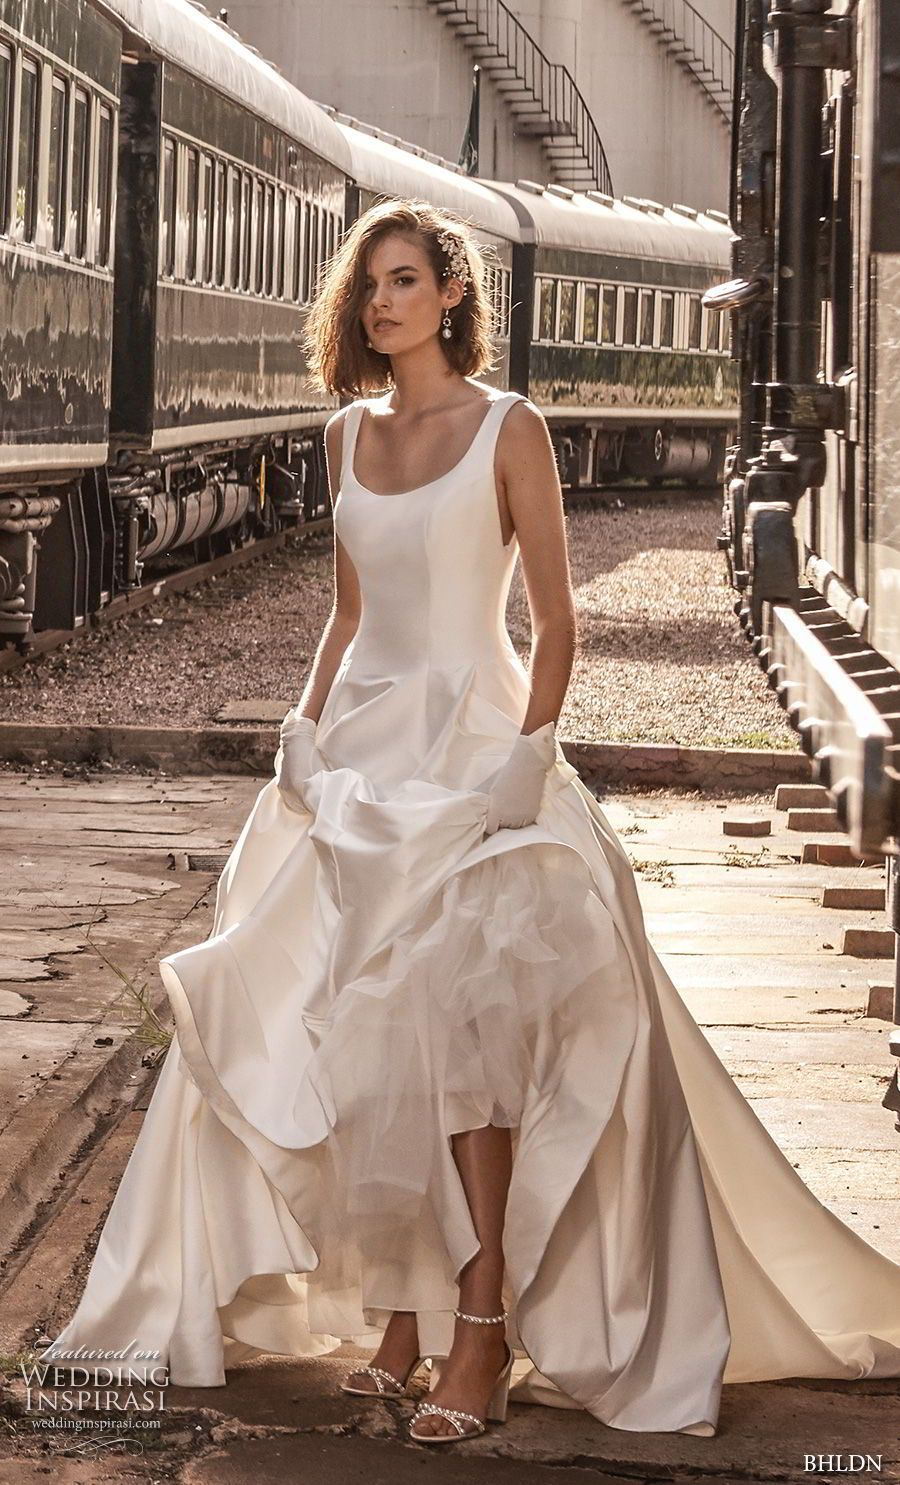 Away we gou bhldn bridal collection wedding dresses